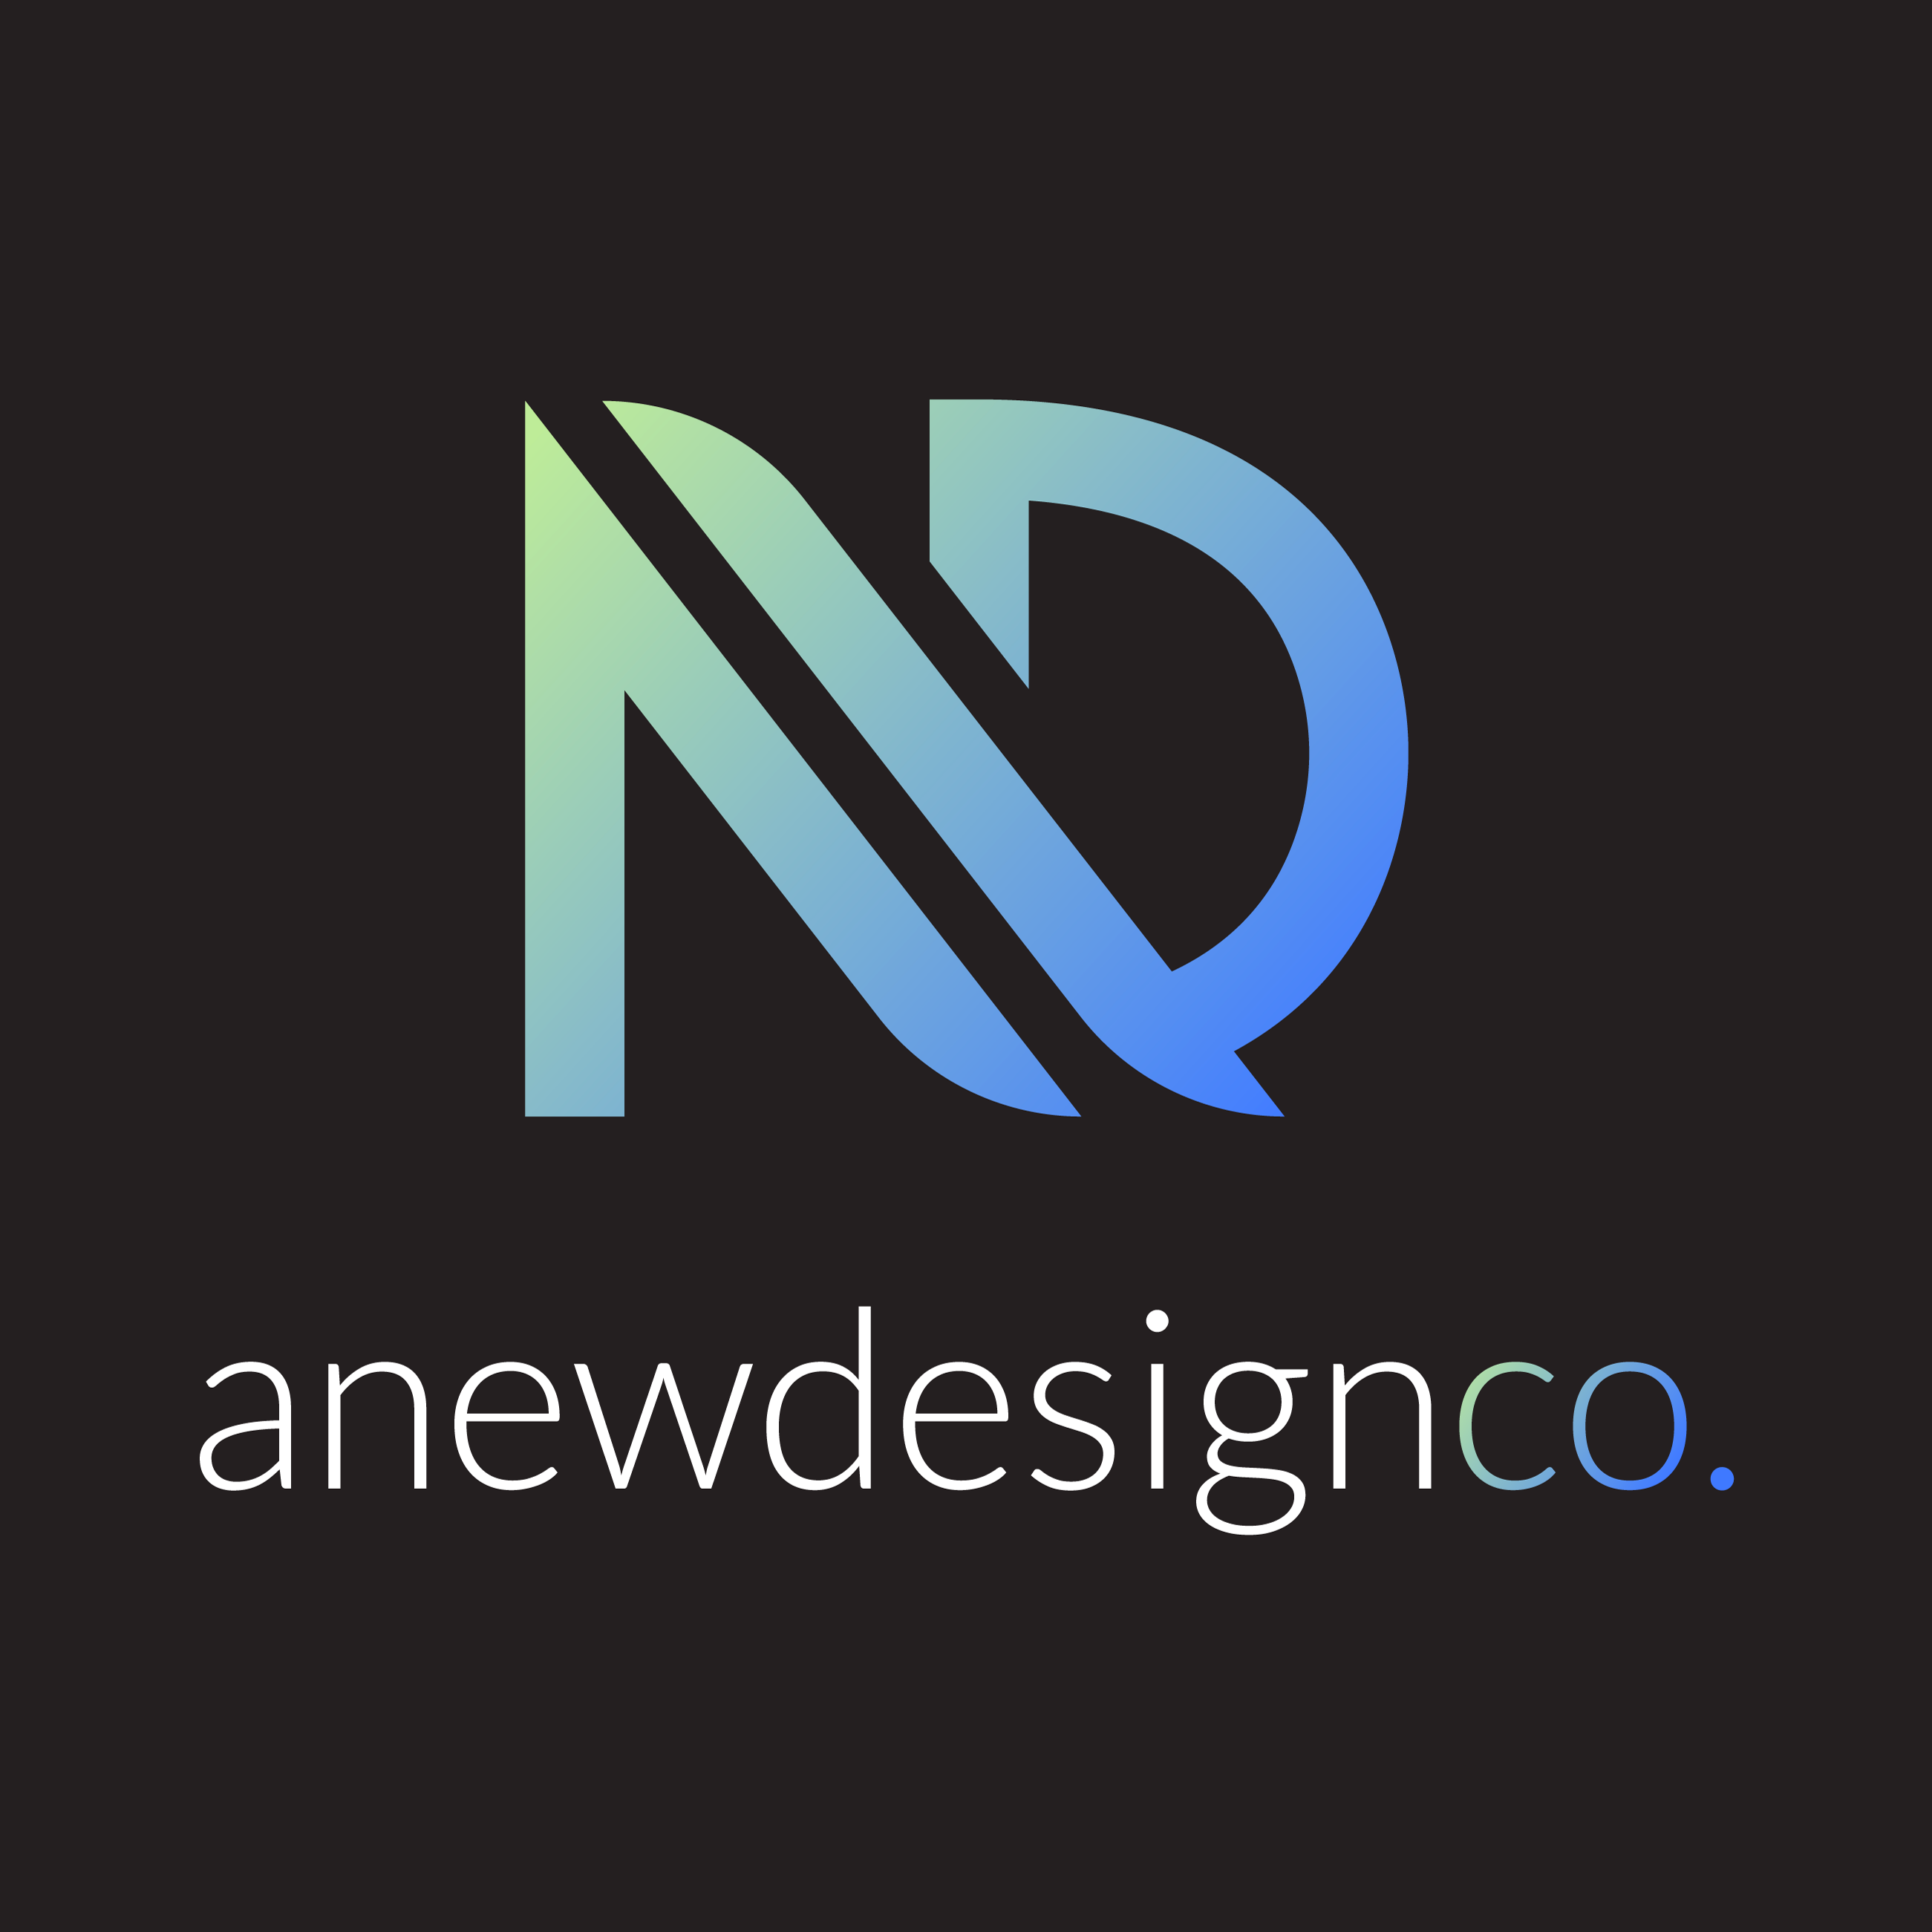 A New Design, Co.